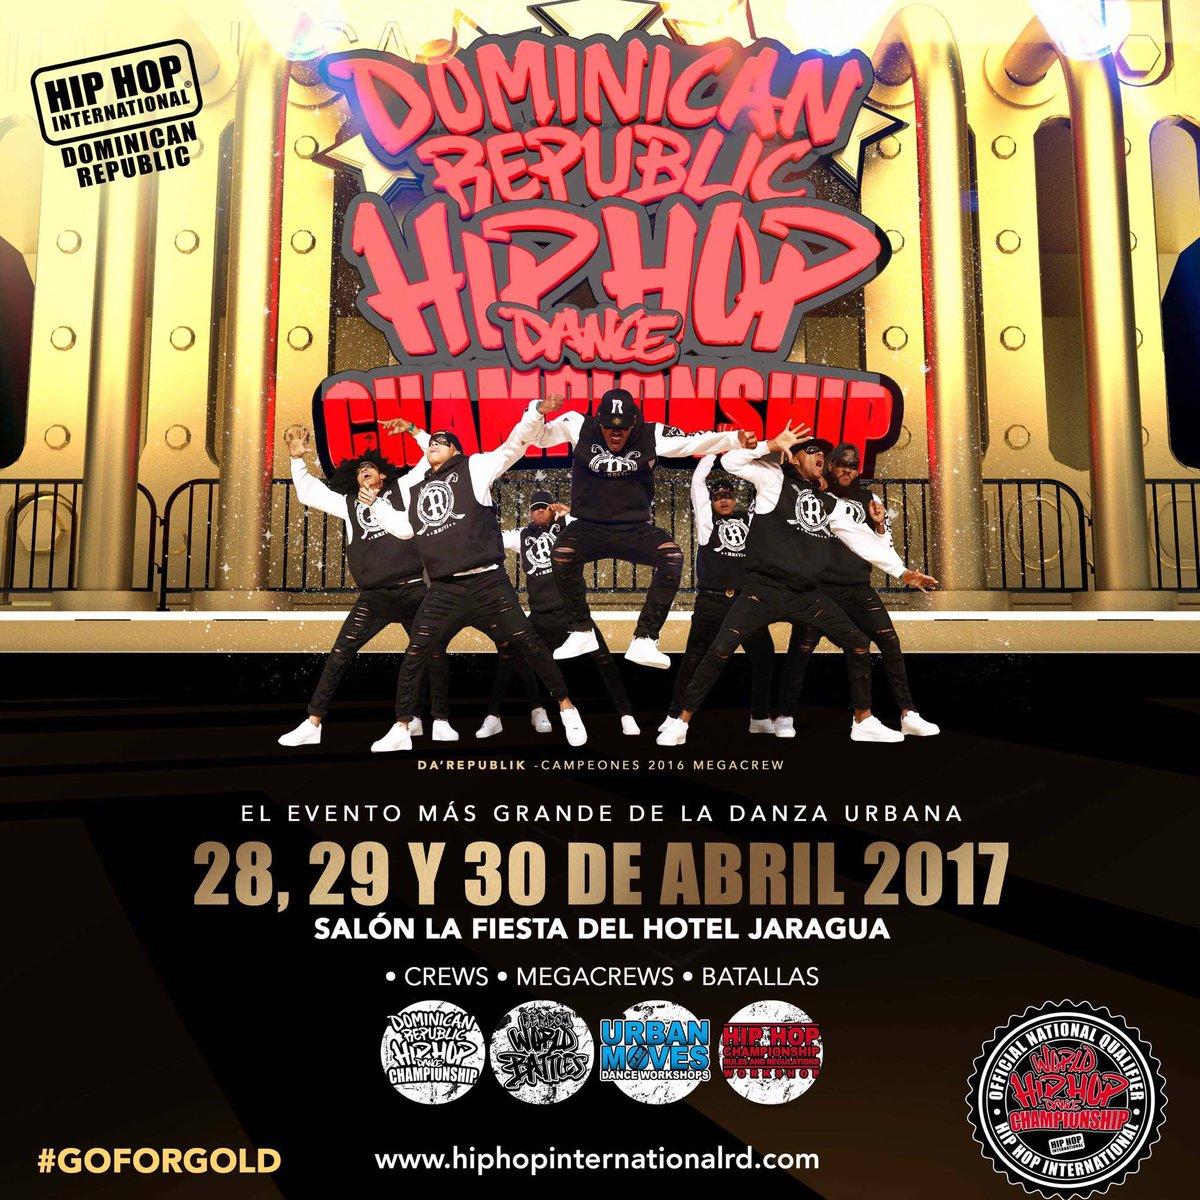 Hip Hop International on Twitter